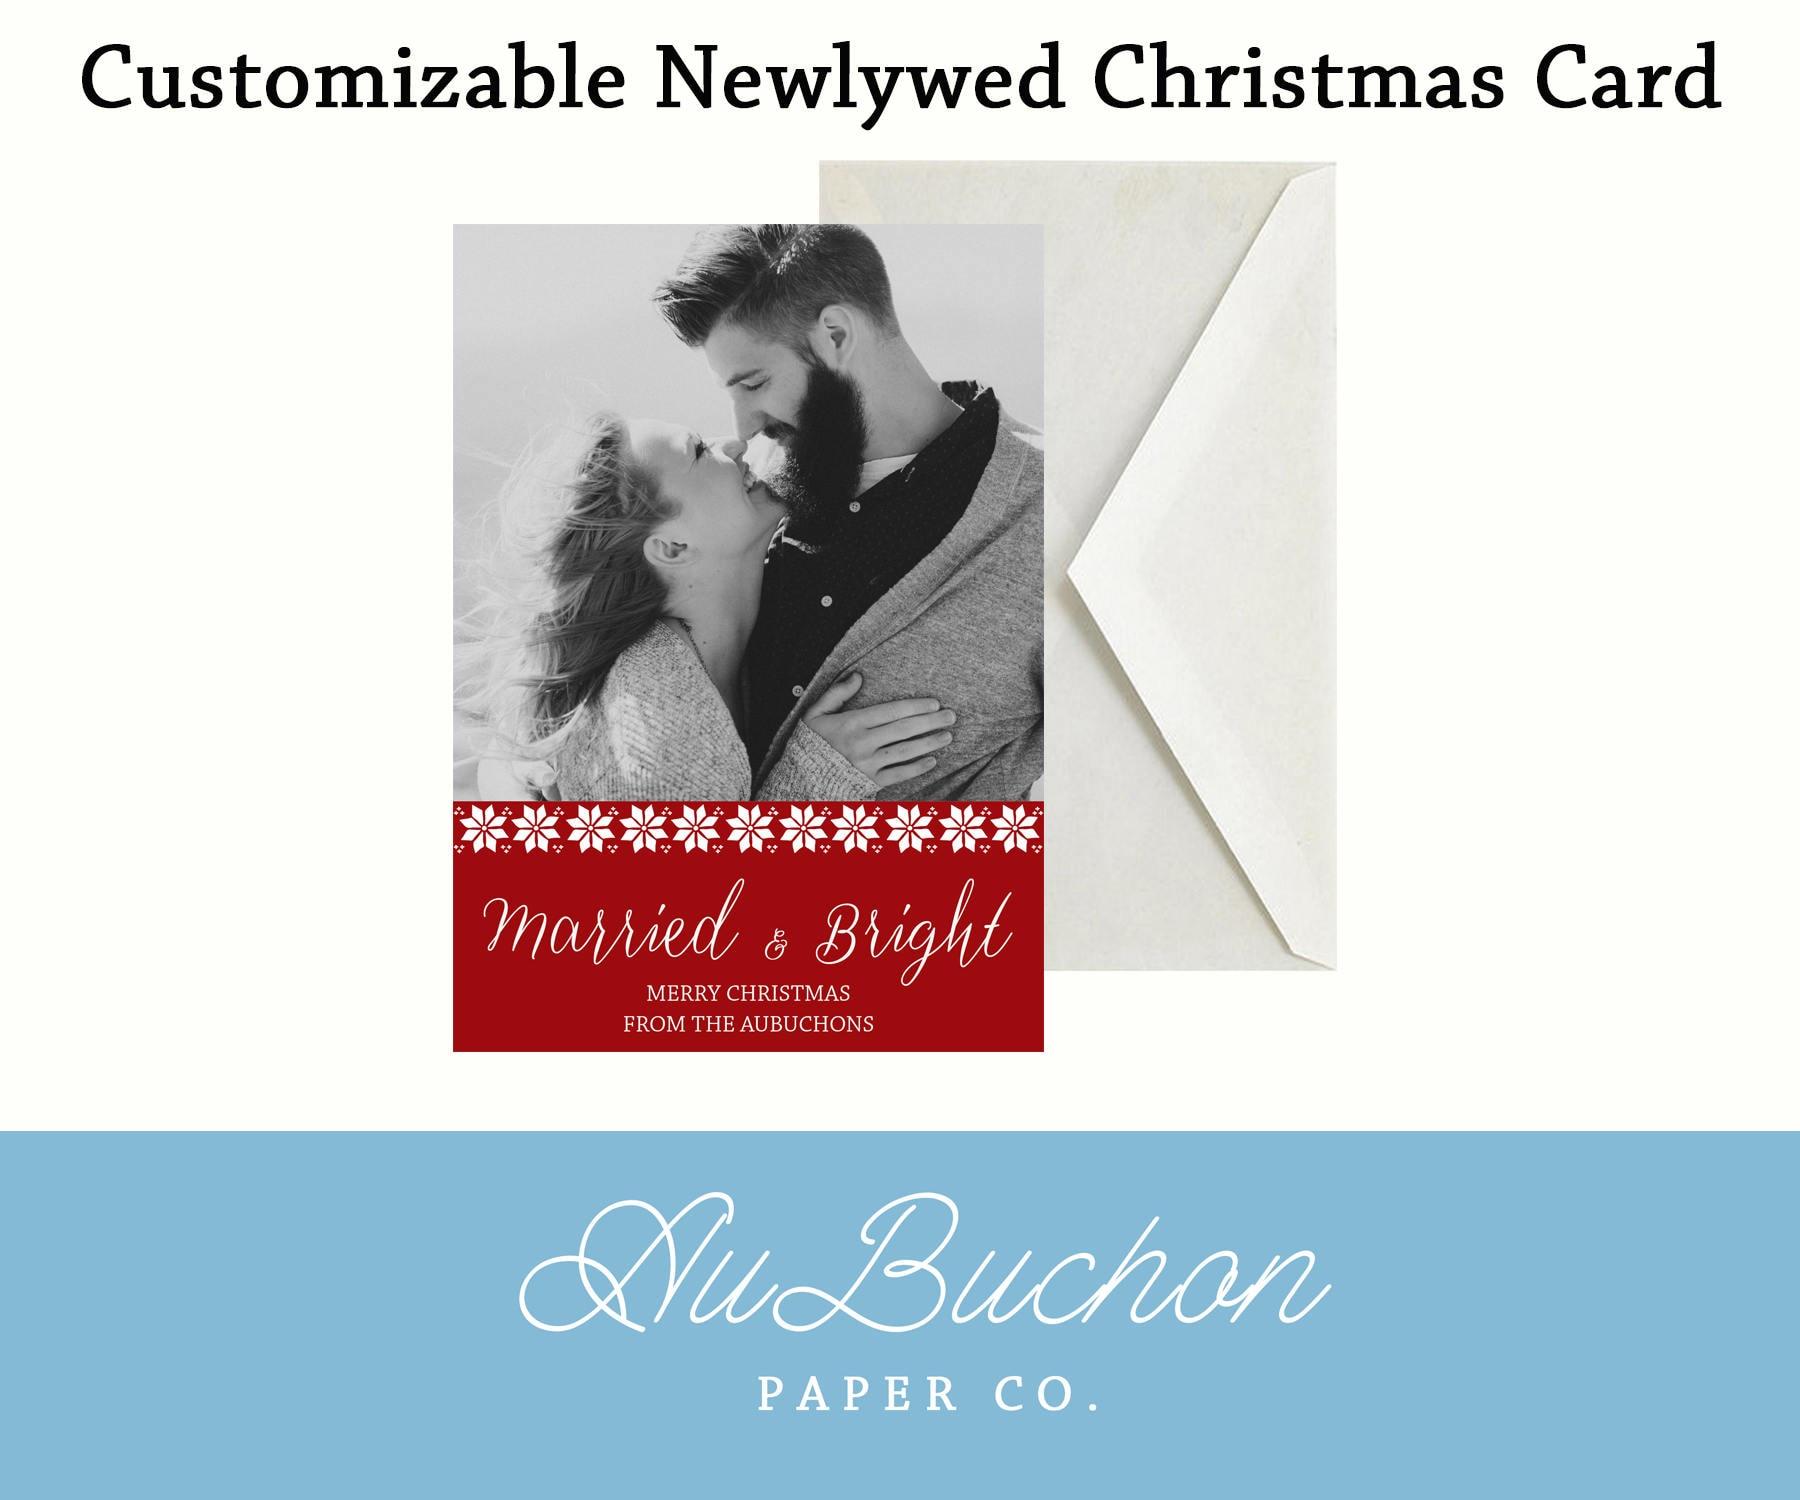 Customizable Newlywed Christmas Card